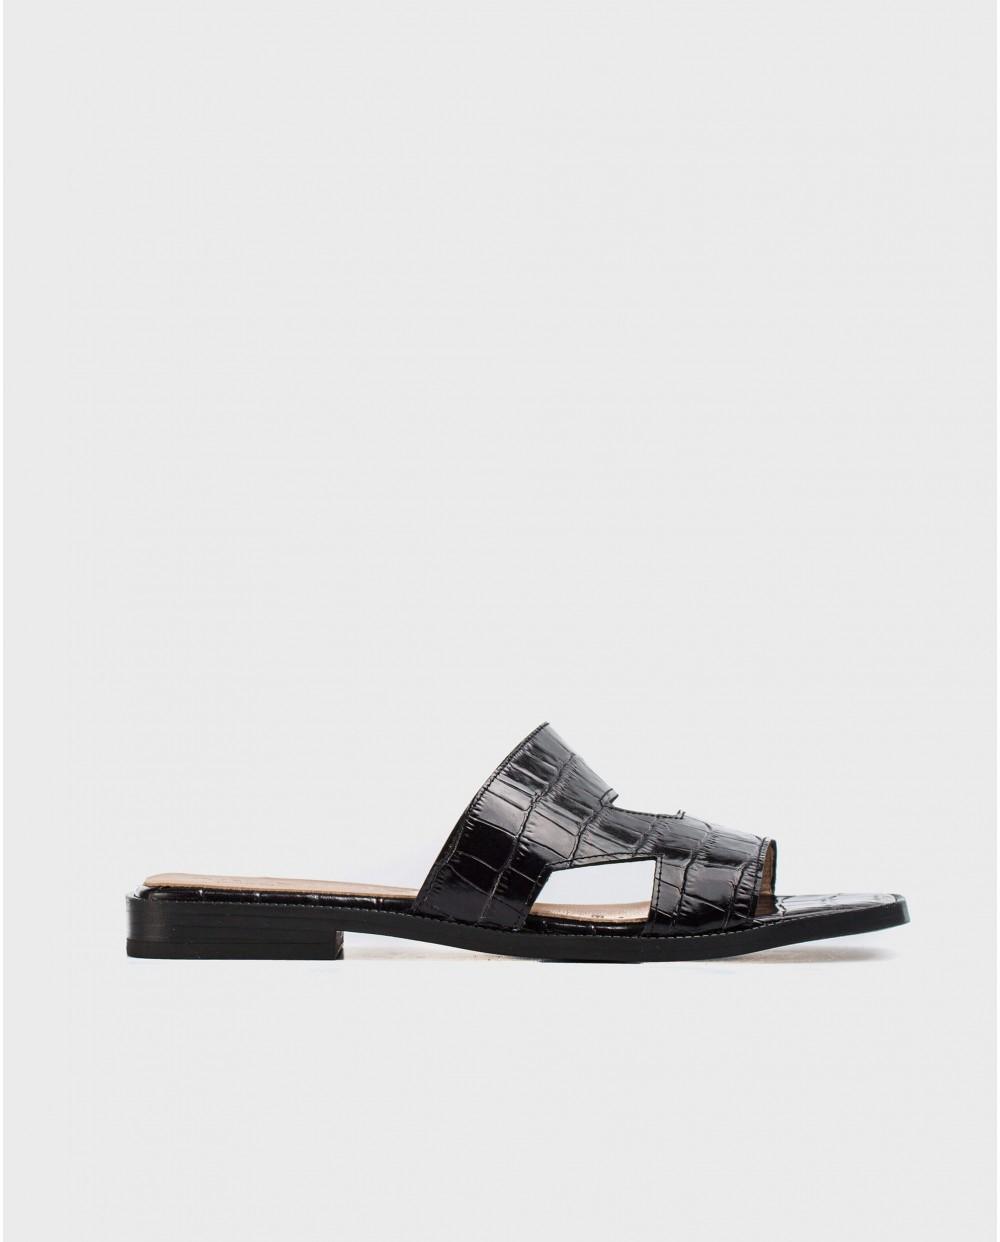 Wonders-Women-Leather flat sandal with side cutouts